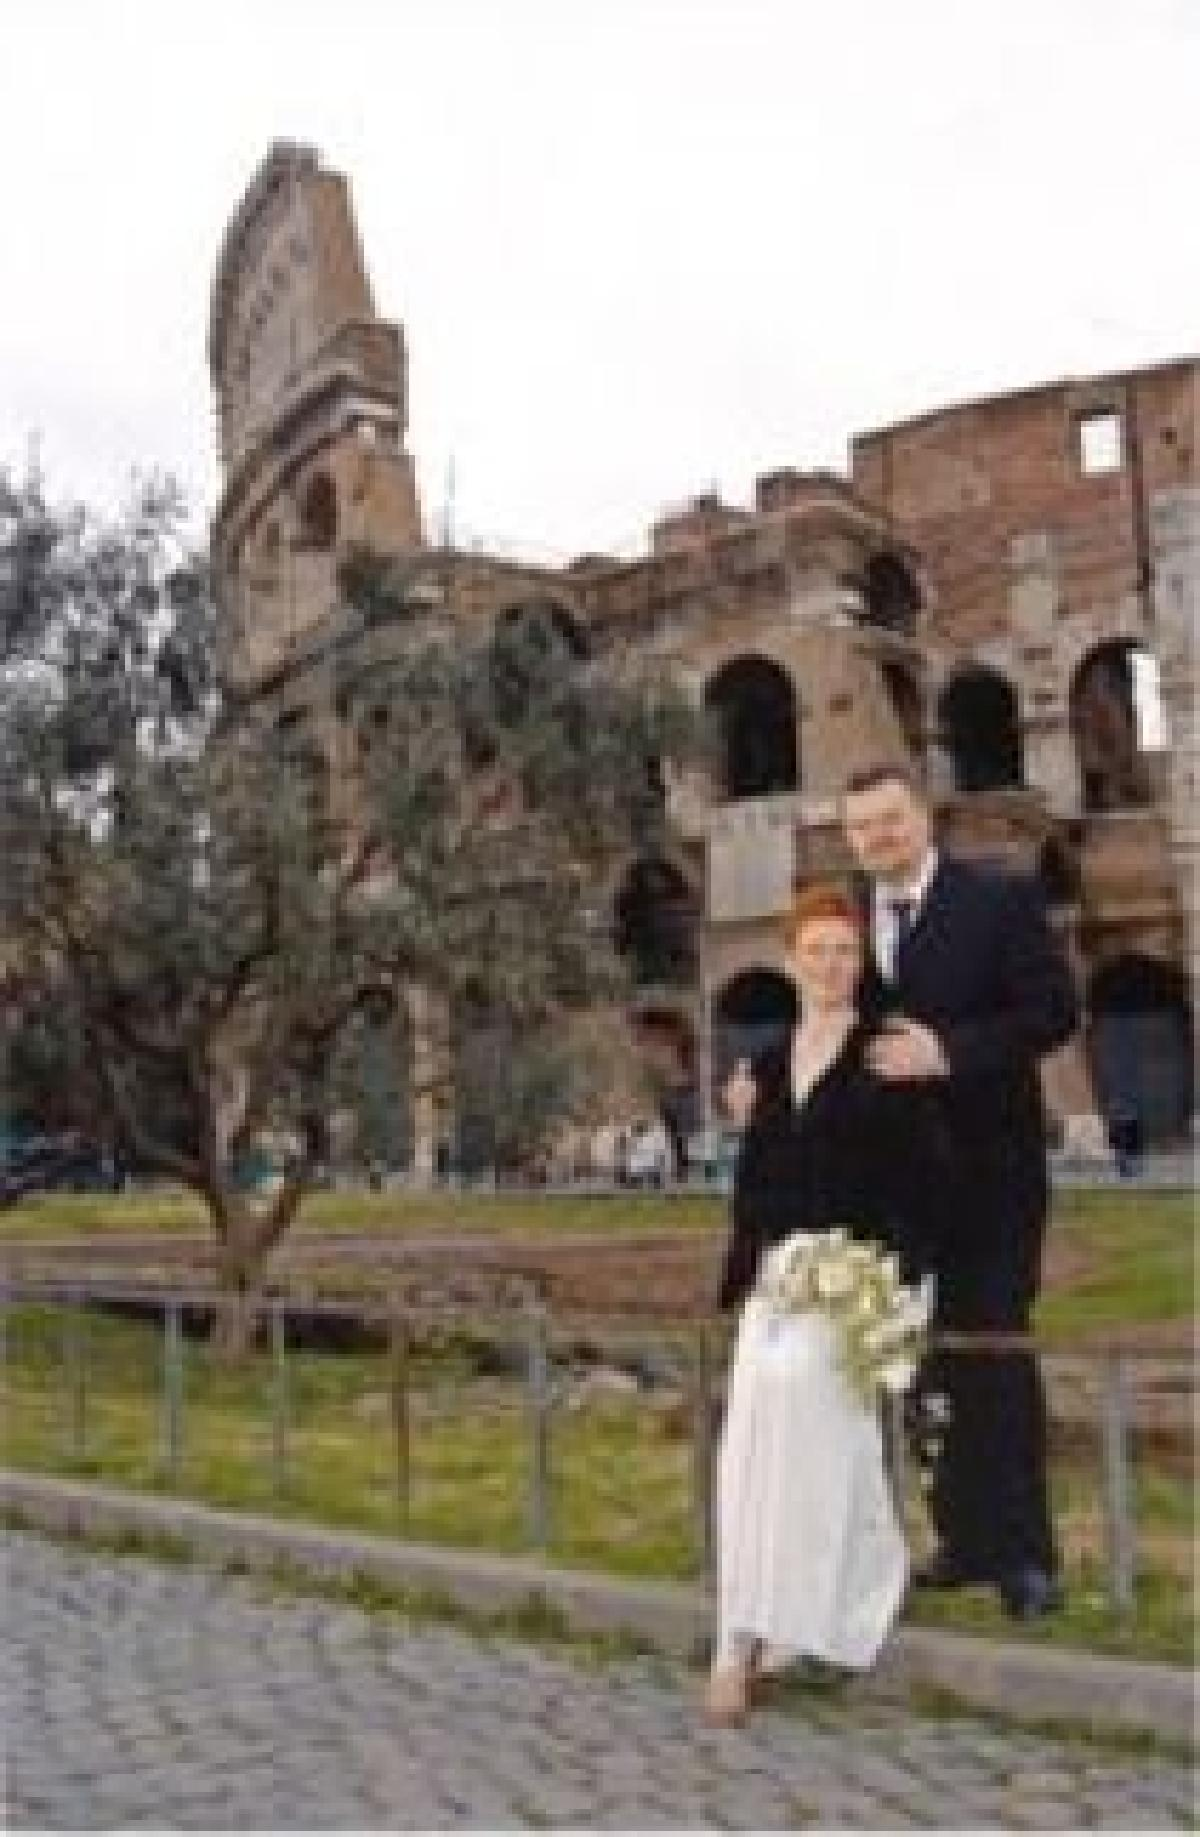 Gry Frifeldt, Roma, 25. januar 2004